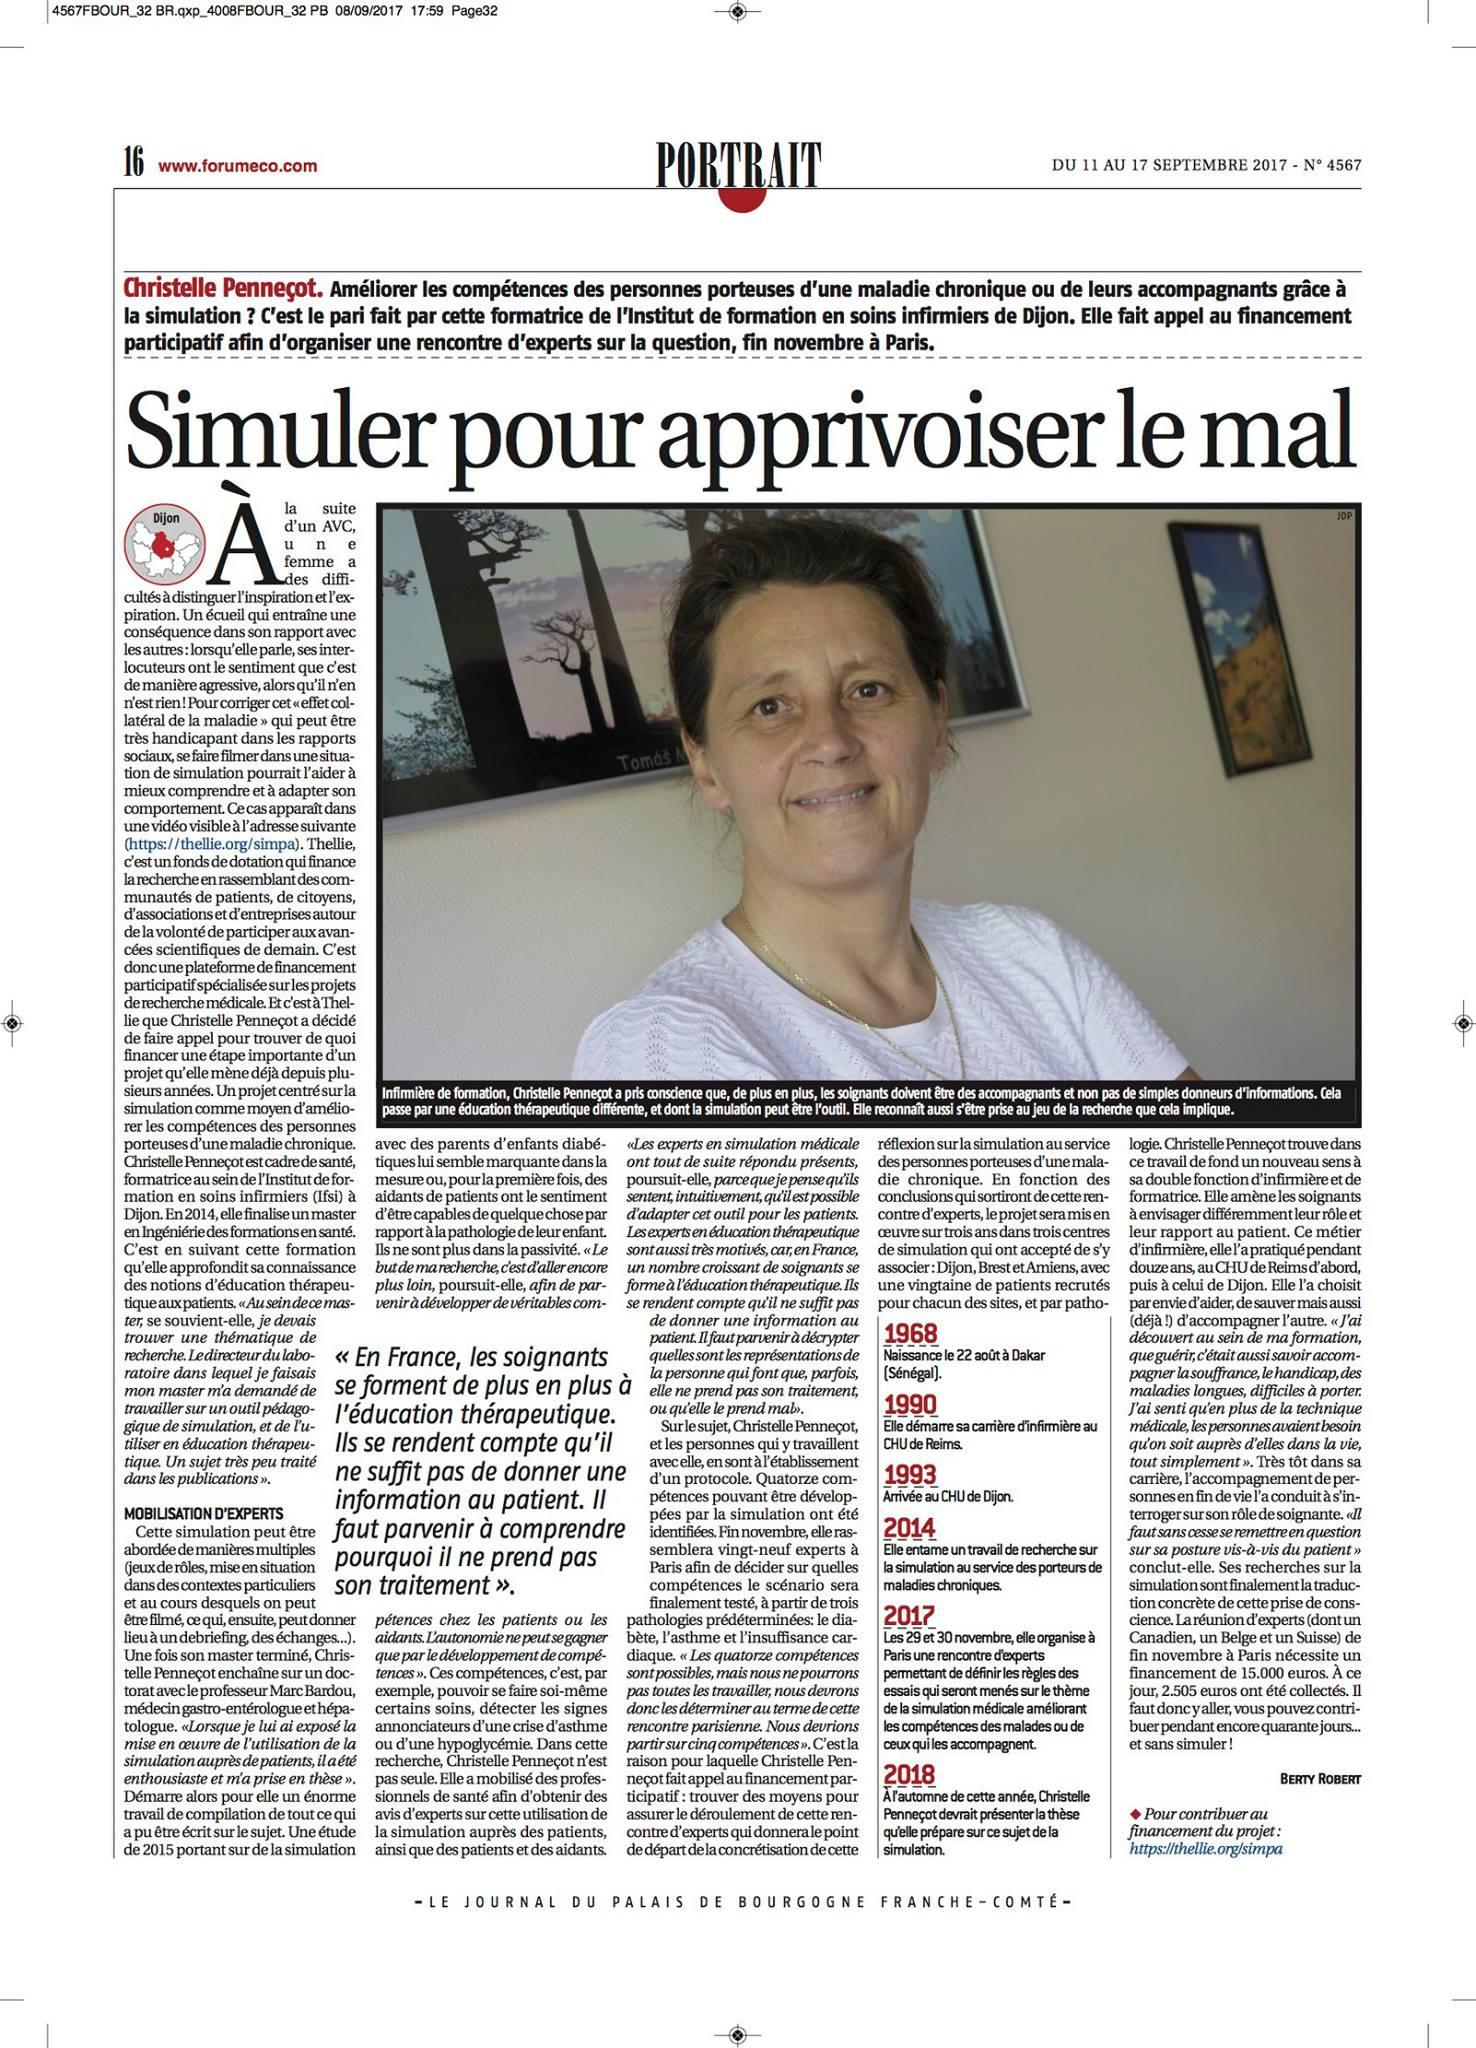 Interview du journal du plais